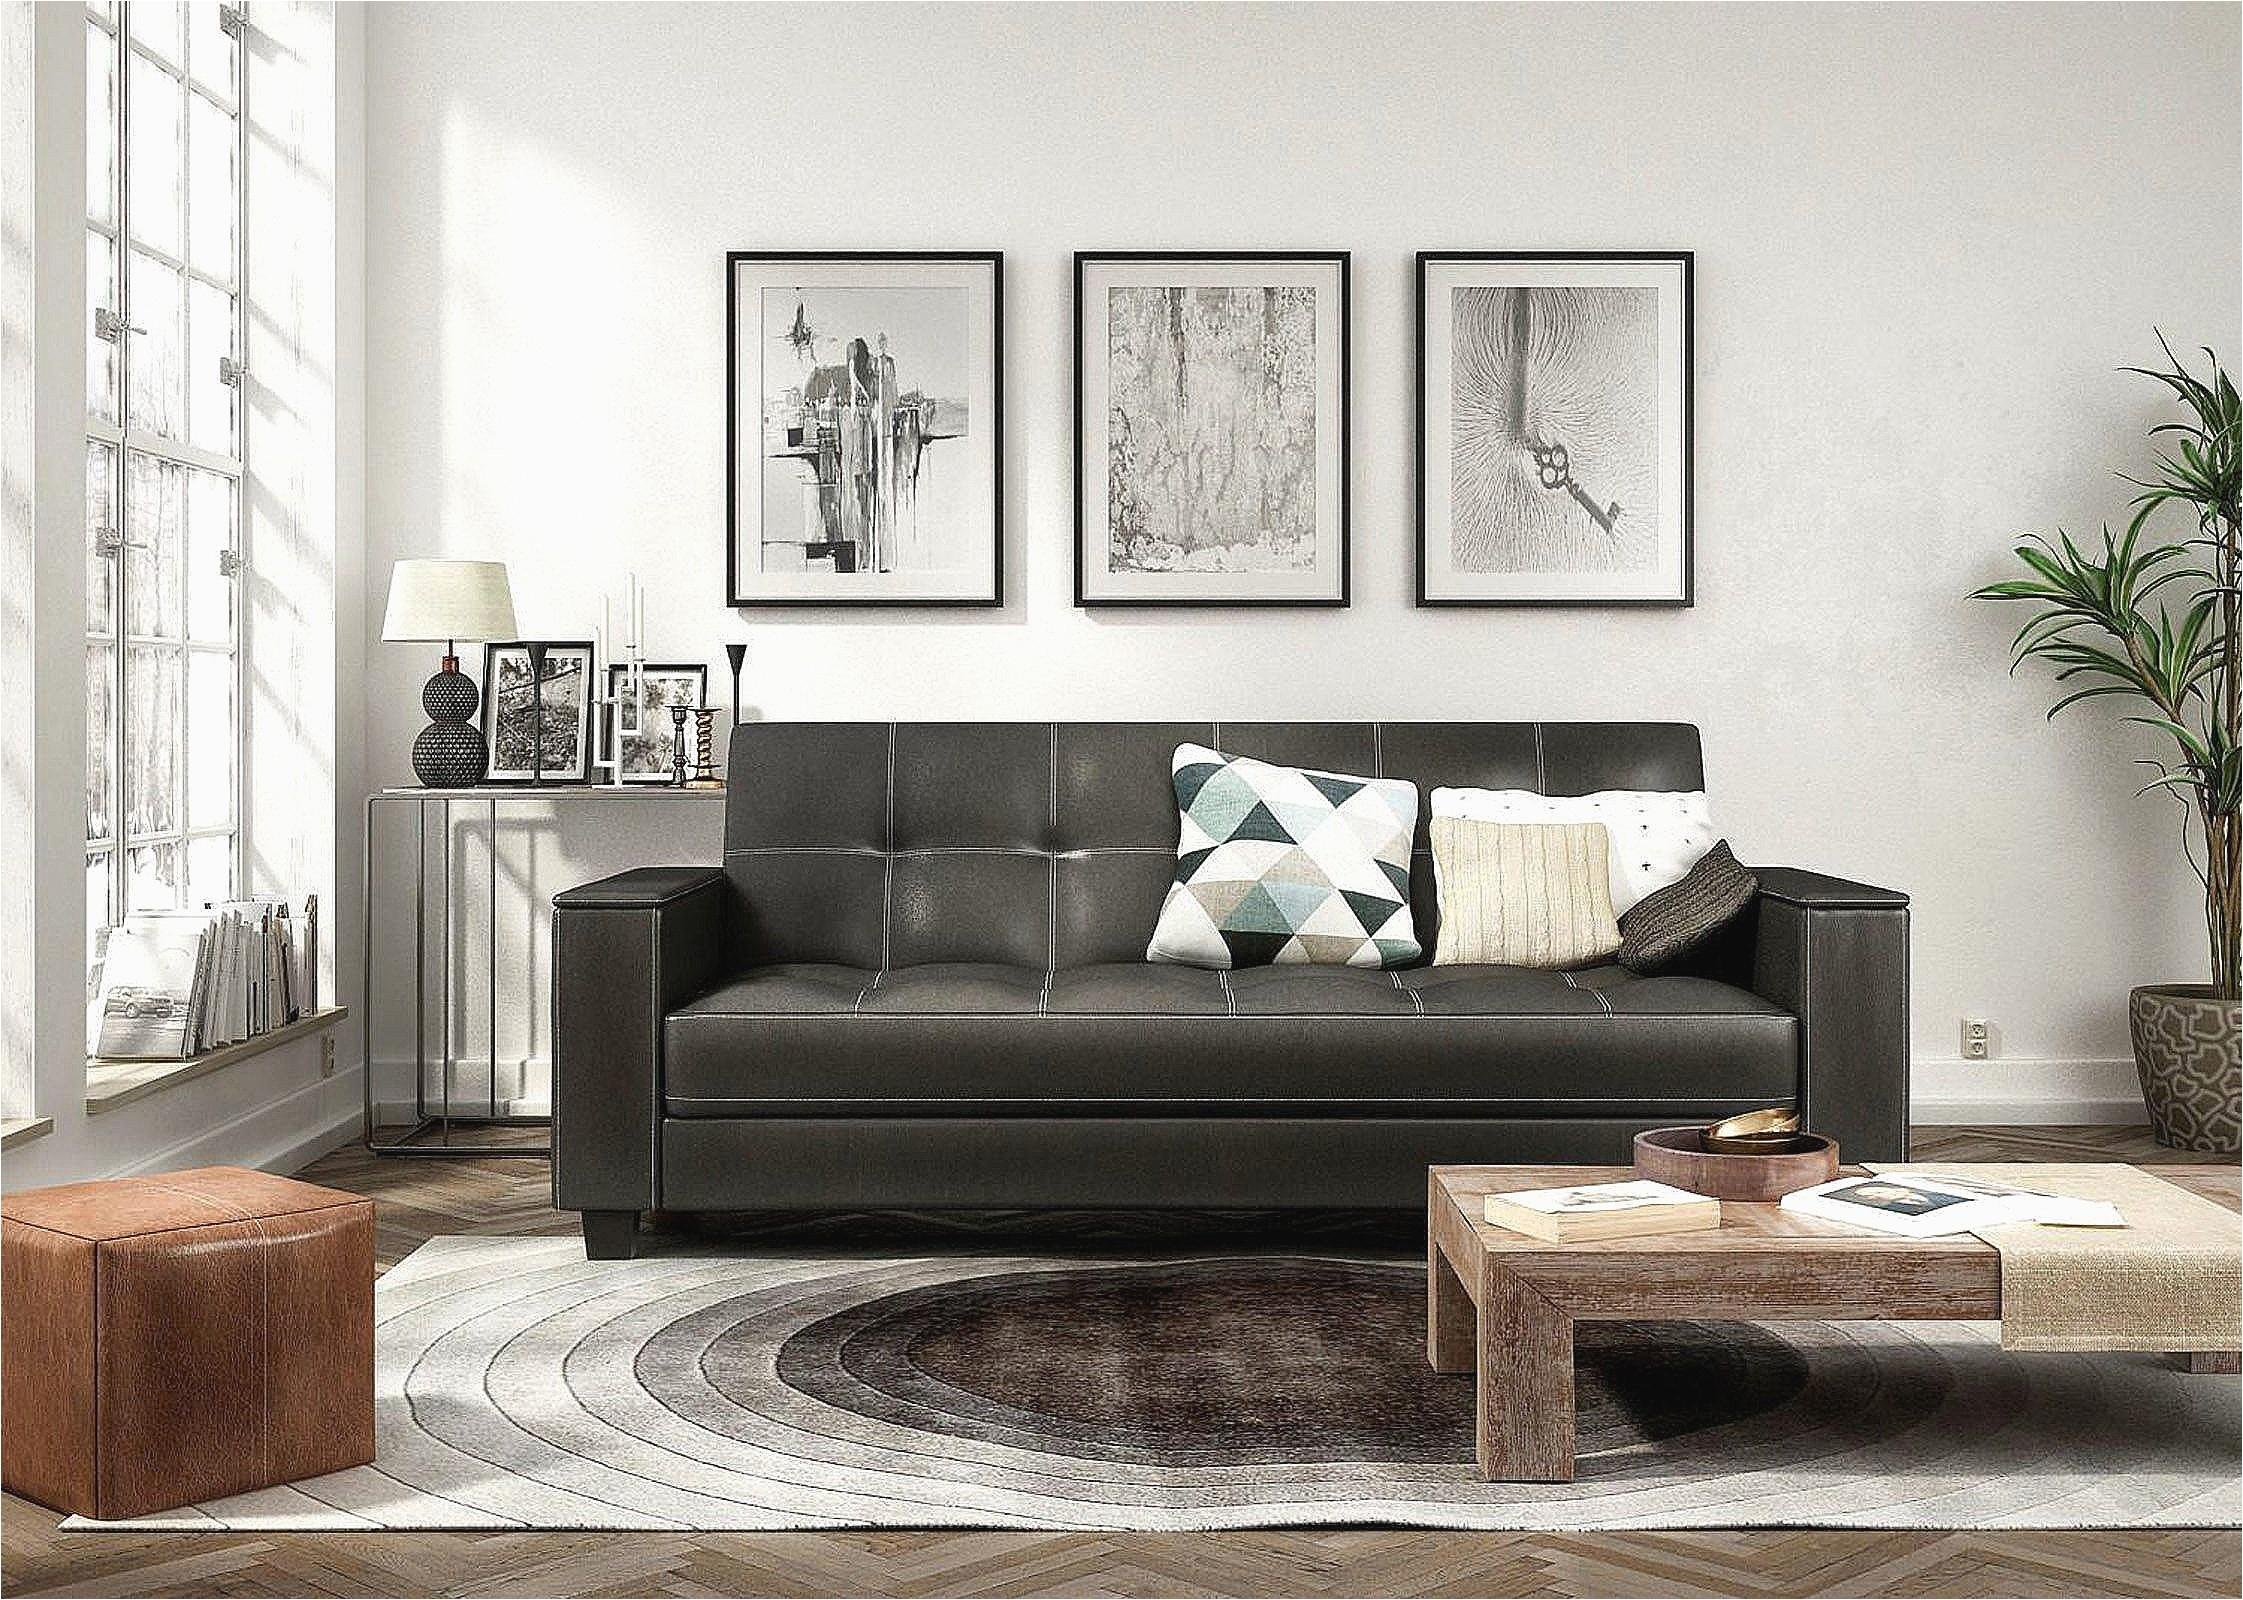 interior design for small spaces s inspirational modern living room furniture new gunstige sofa macys furniture